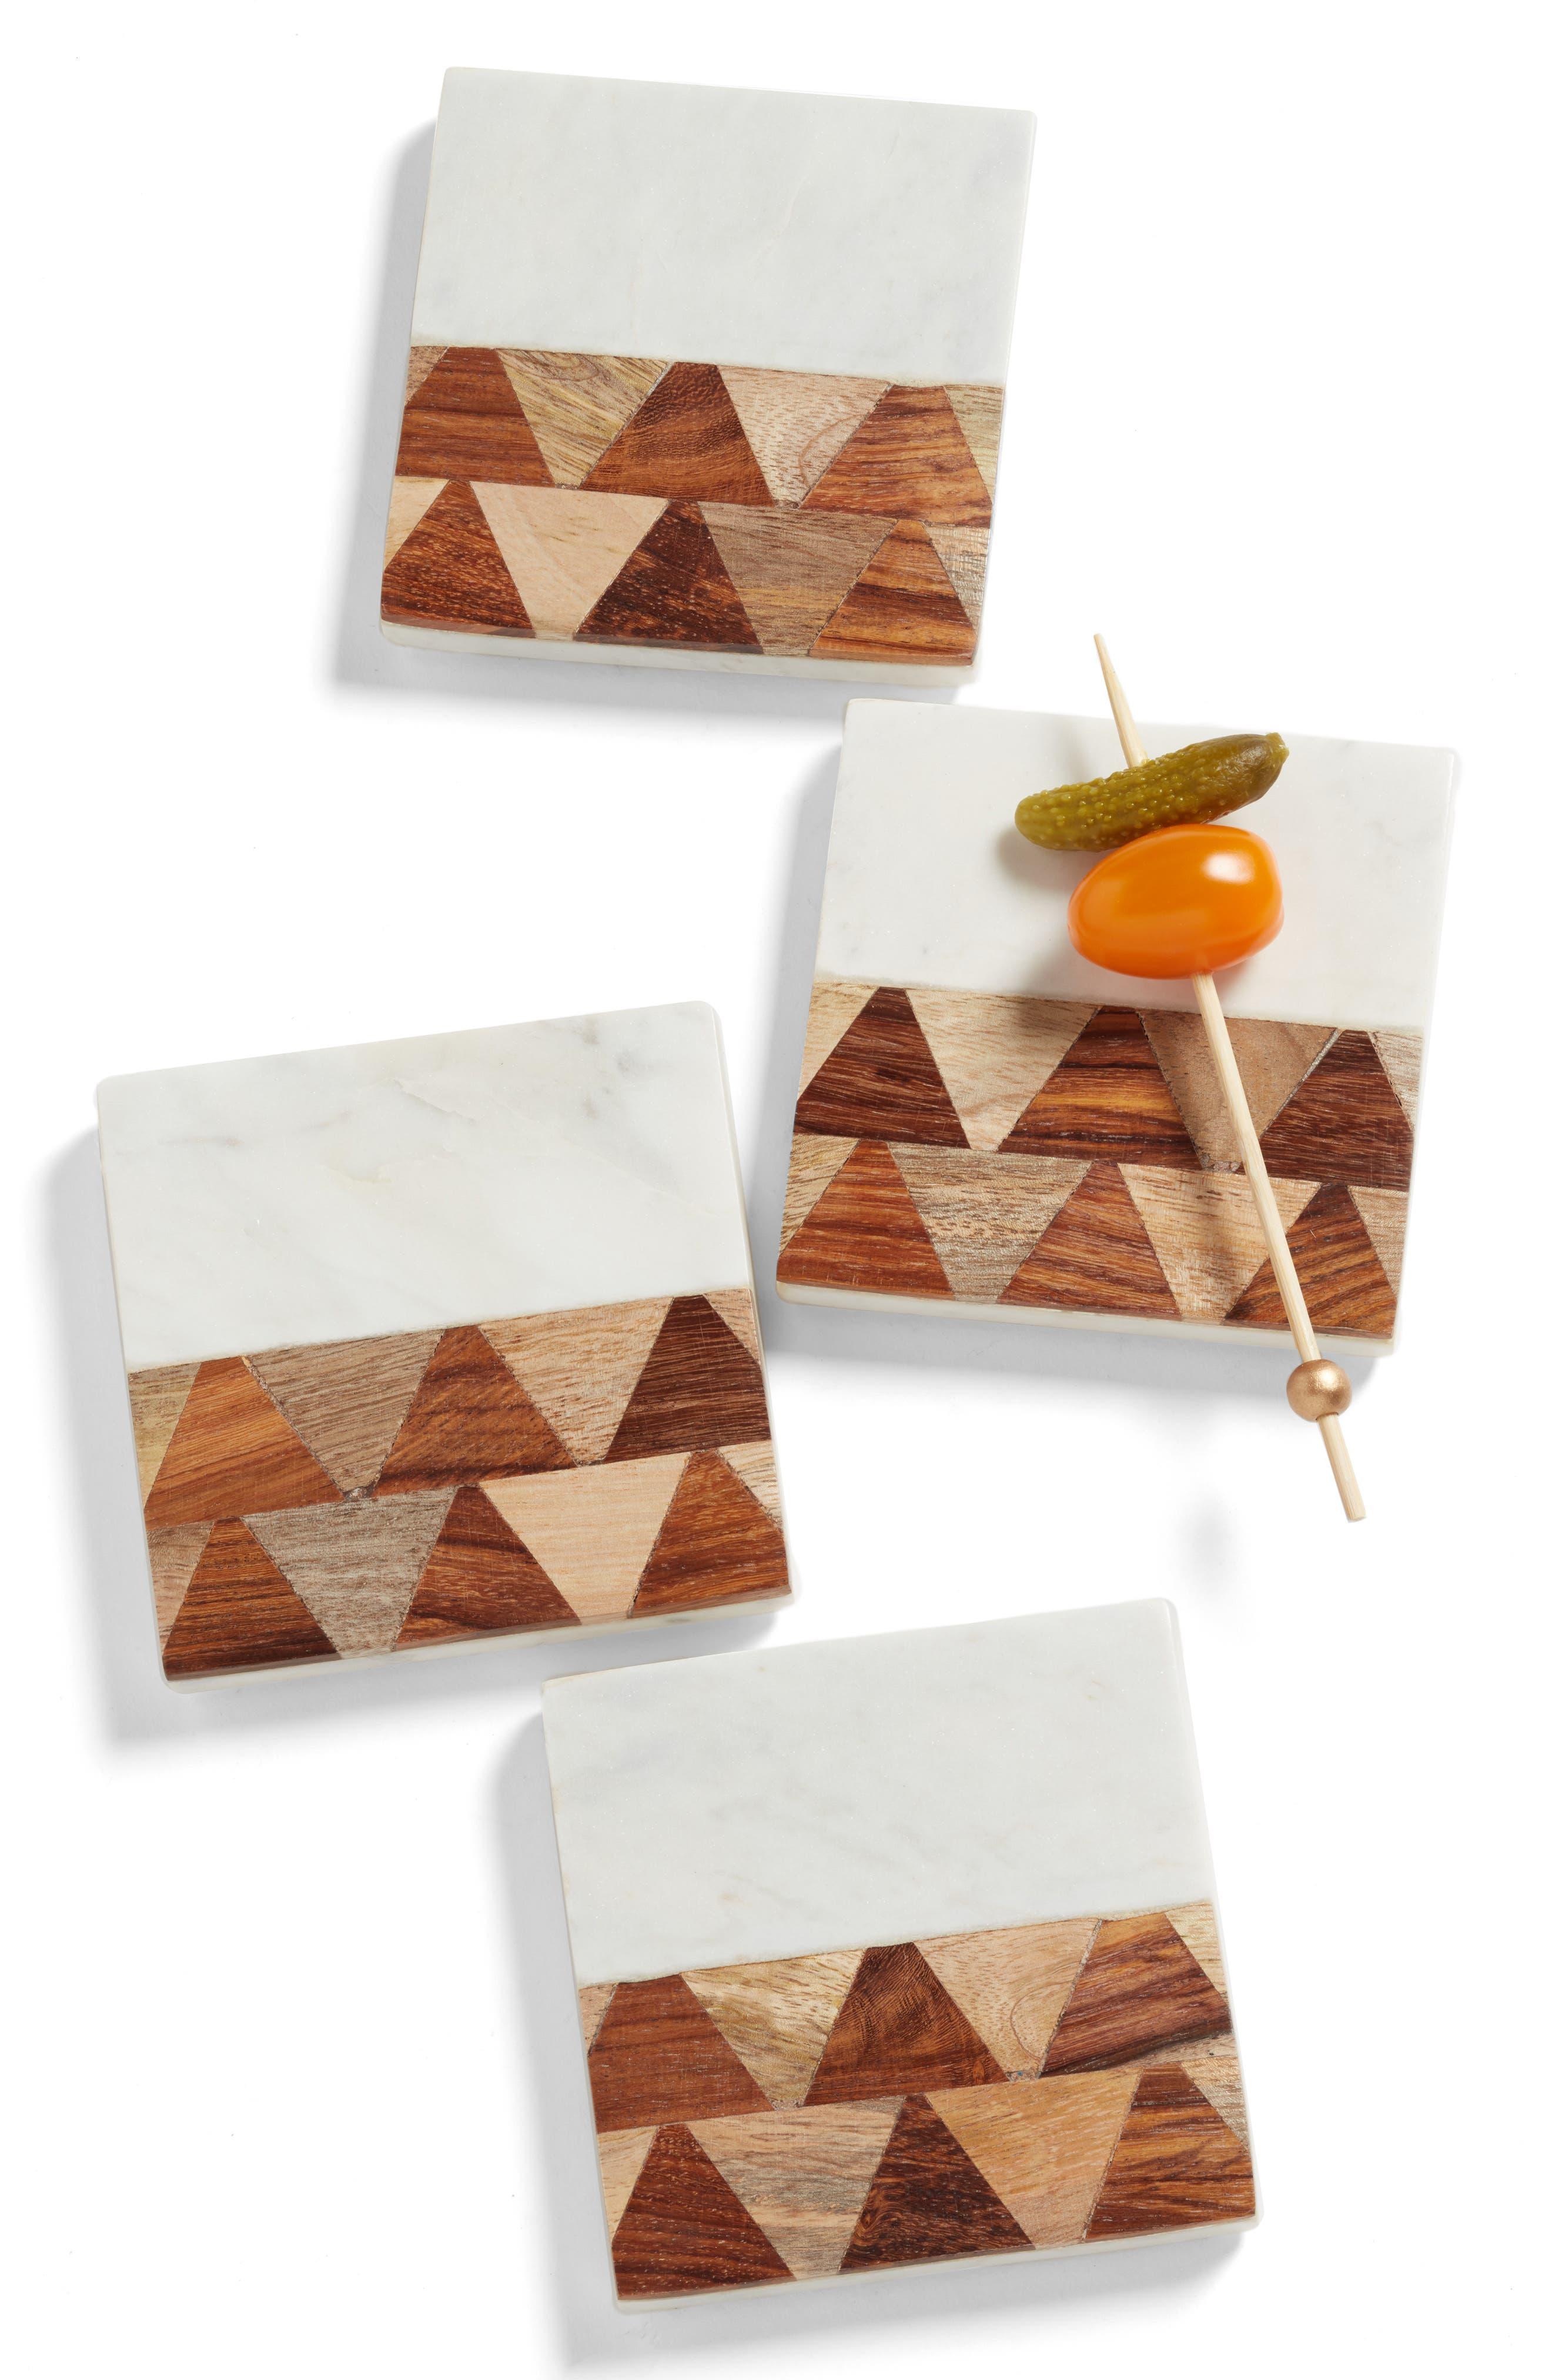 Chevron Set of 4 Marble & Wood Coasters,                             Main thumbnail 1, color,                             WHITE MULTI